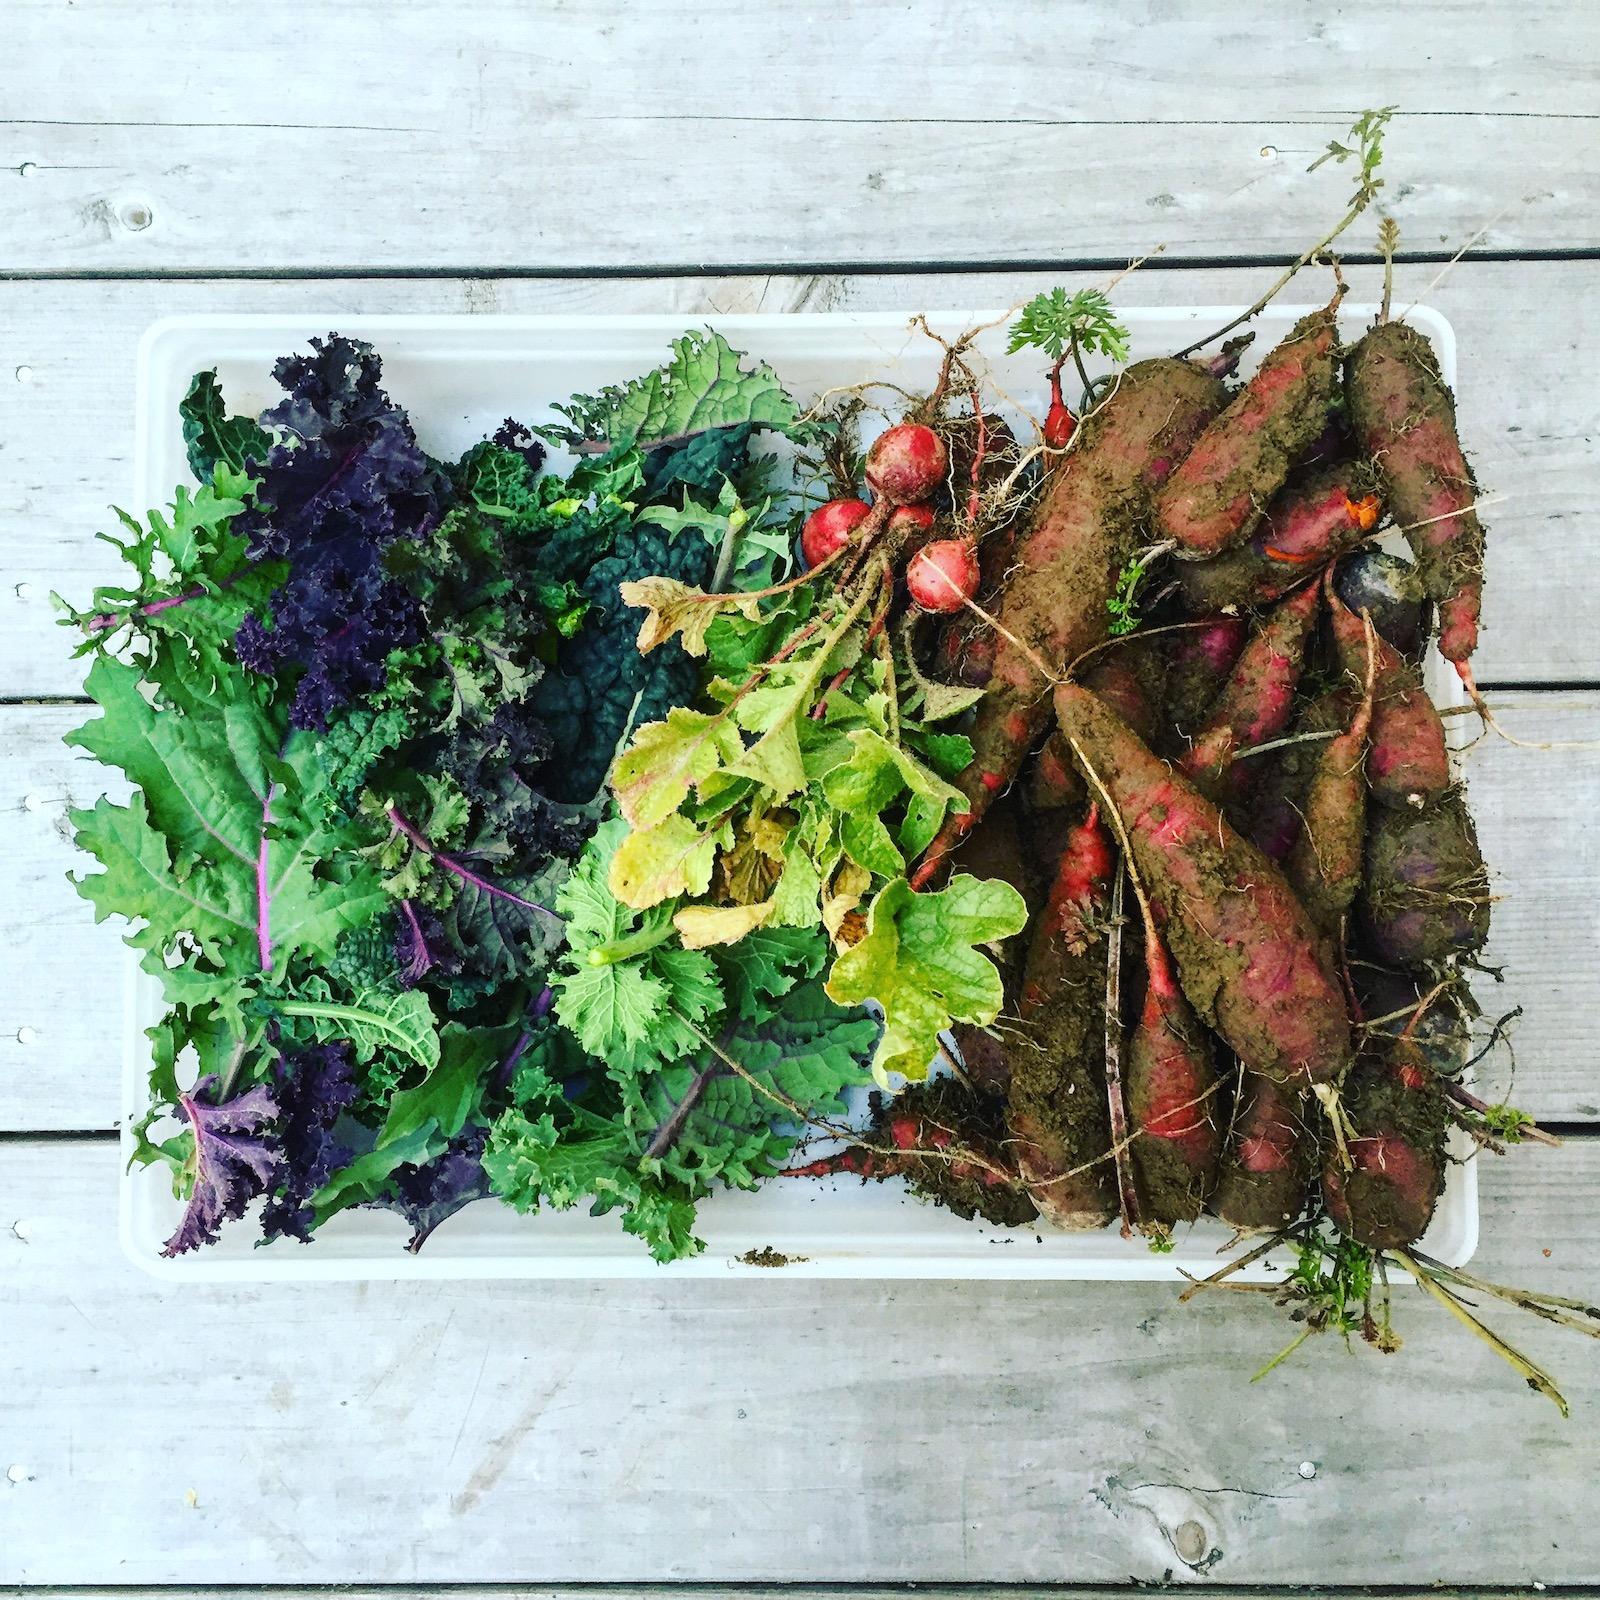 kale, carrots, radishes. Maine and organic.